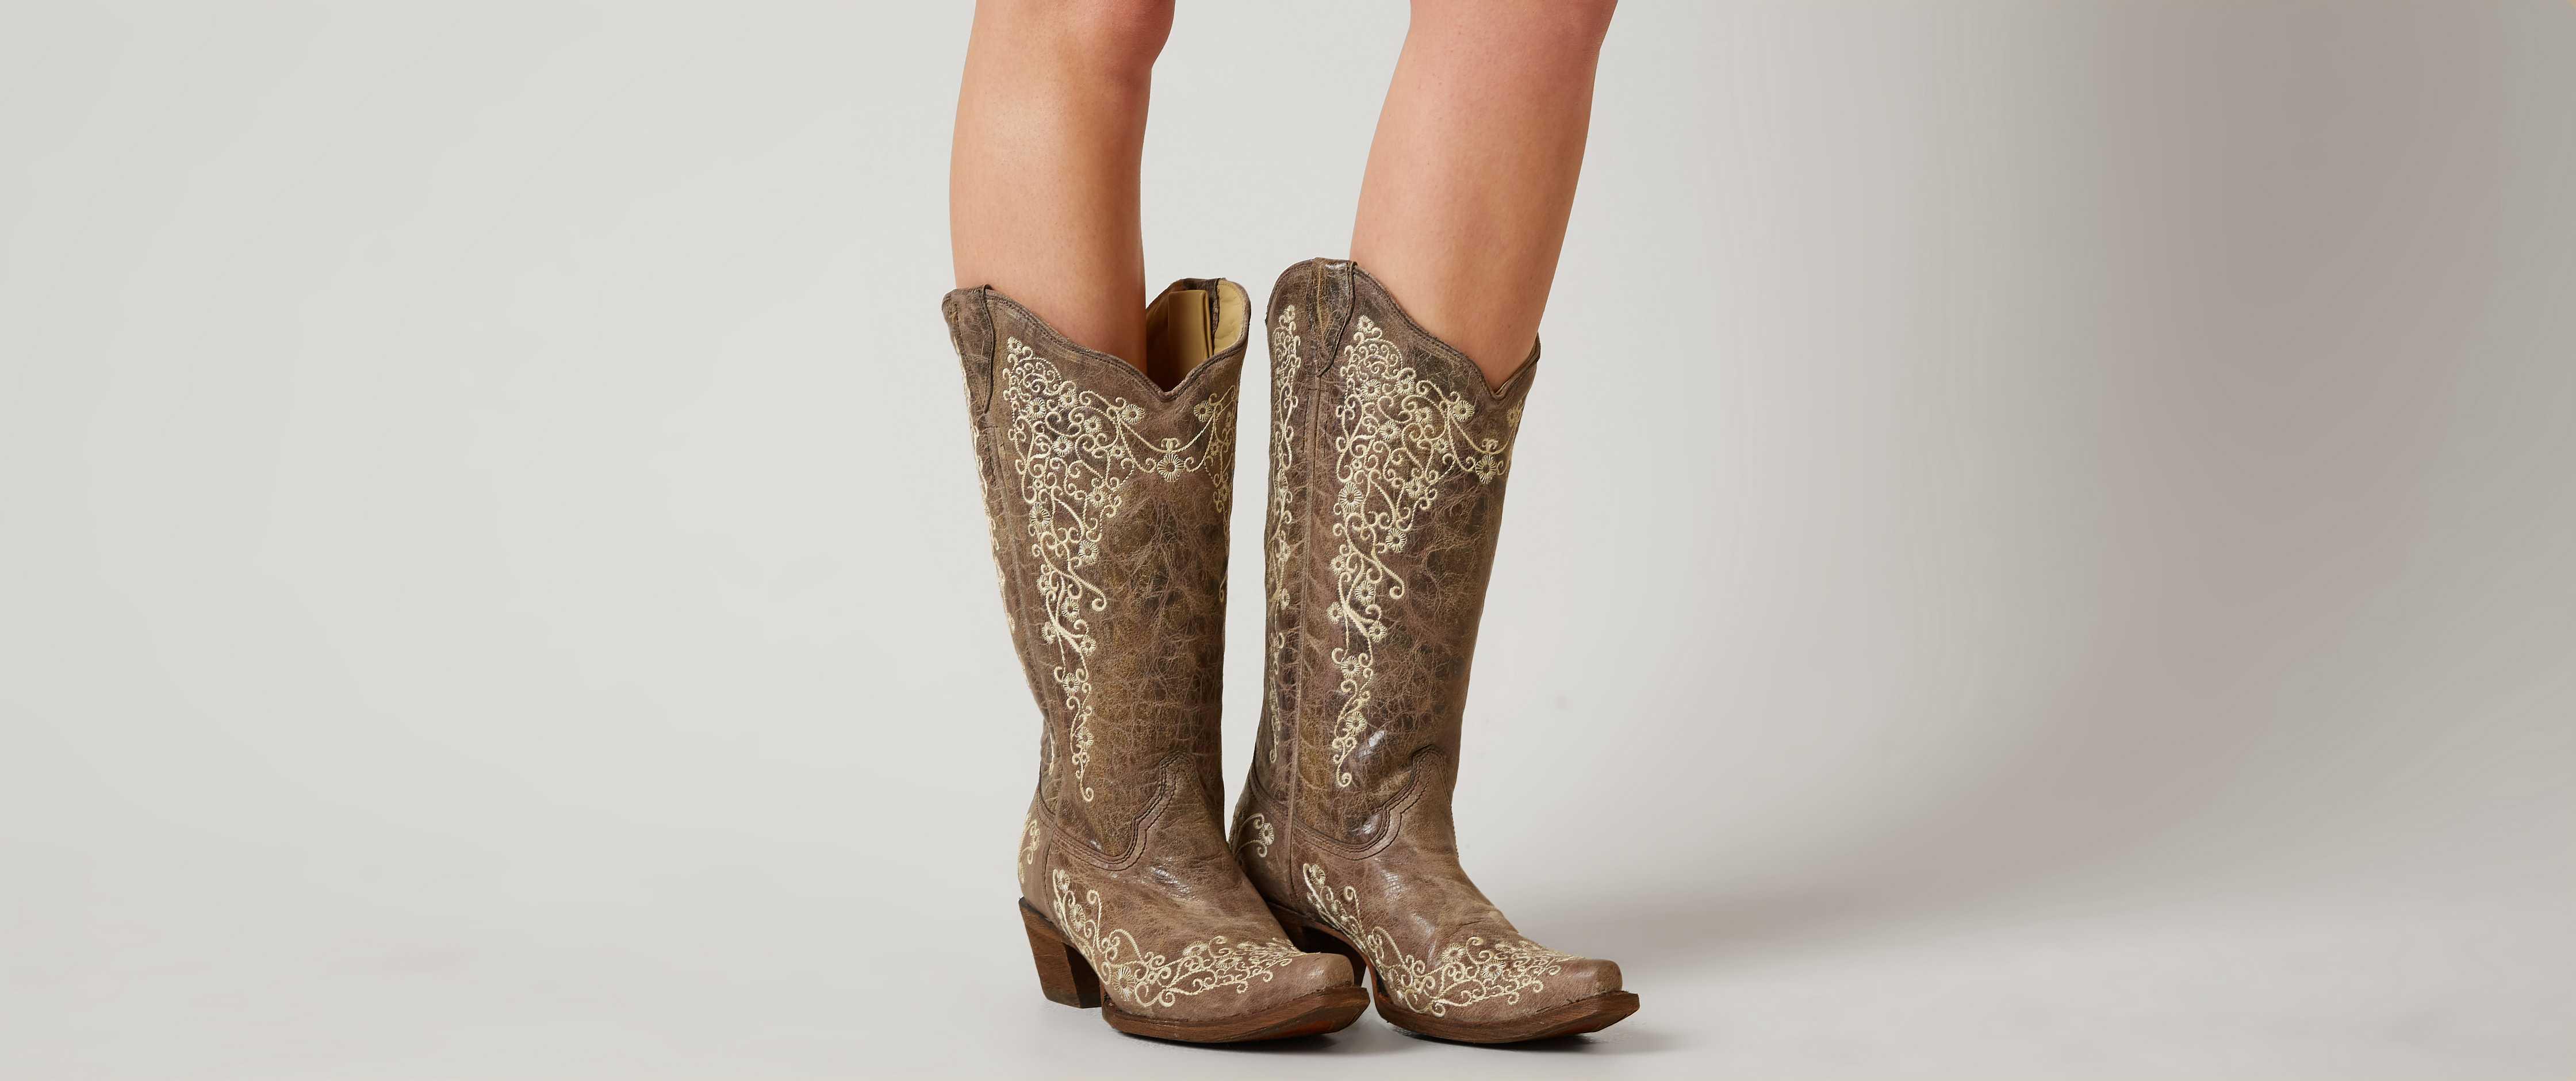 Women boots wearing tips